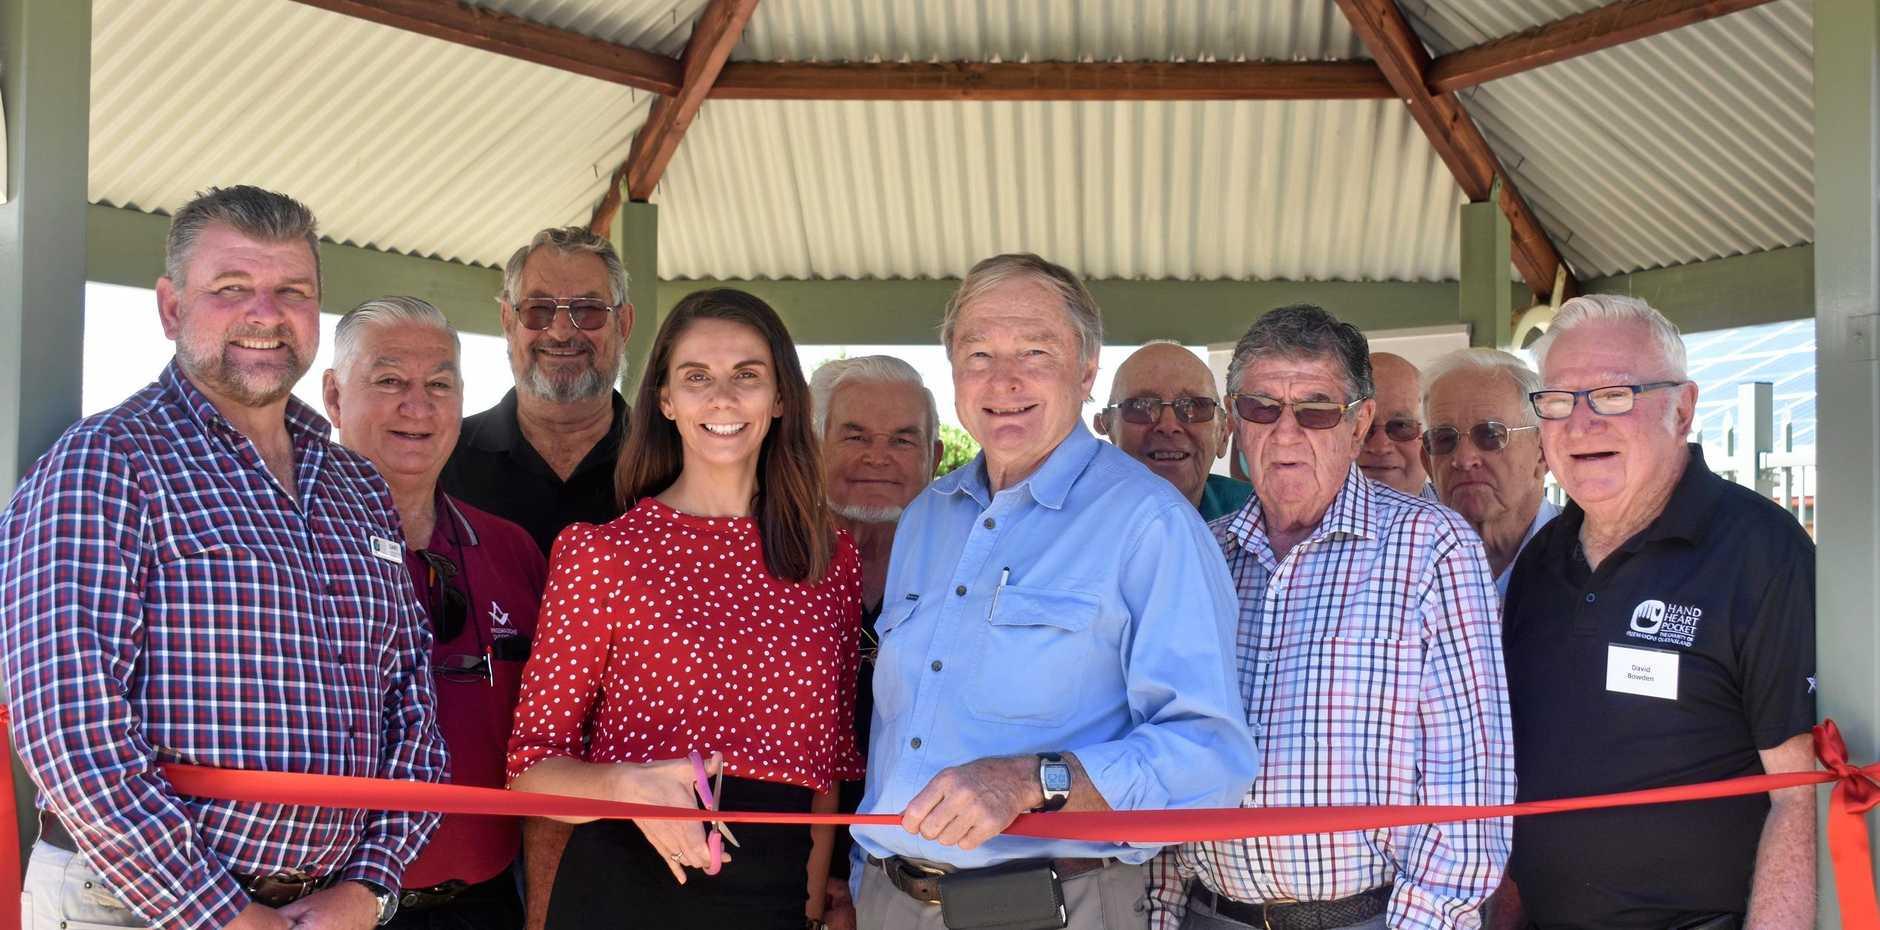 Gary Mark, CEO of Hand Heart Pocket, Melanie Calvert, CEO of Pinaroo, Howard Hobbs, Chairman and members of Roma Freemasons at the opening of a newly landscaped garden at Pinaroo.